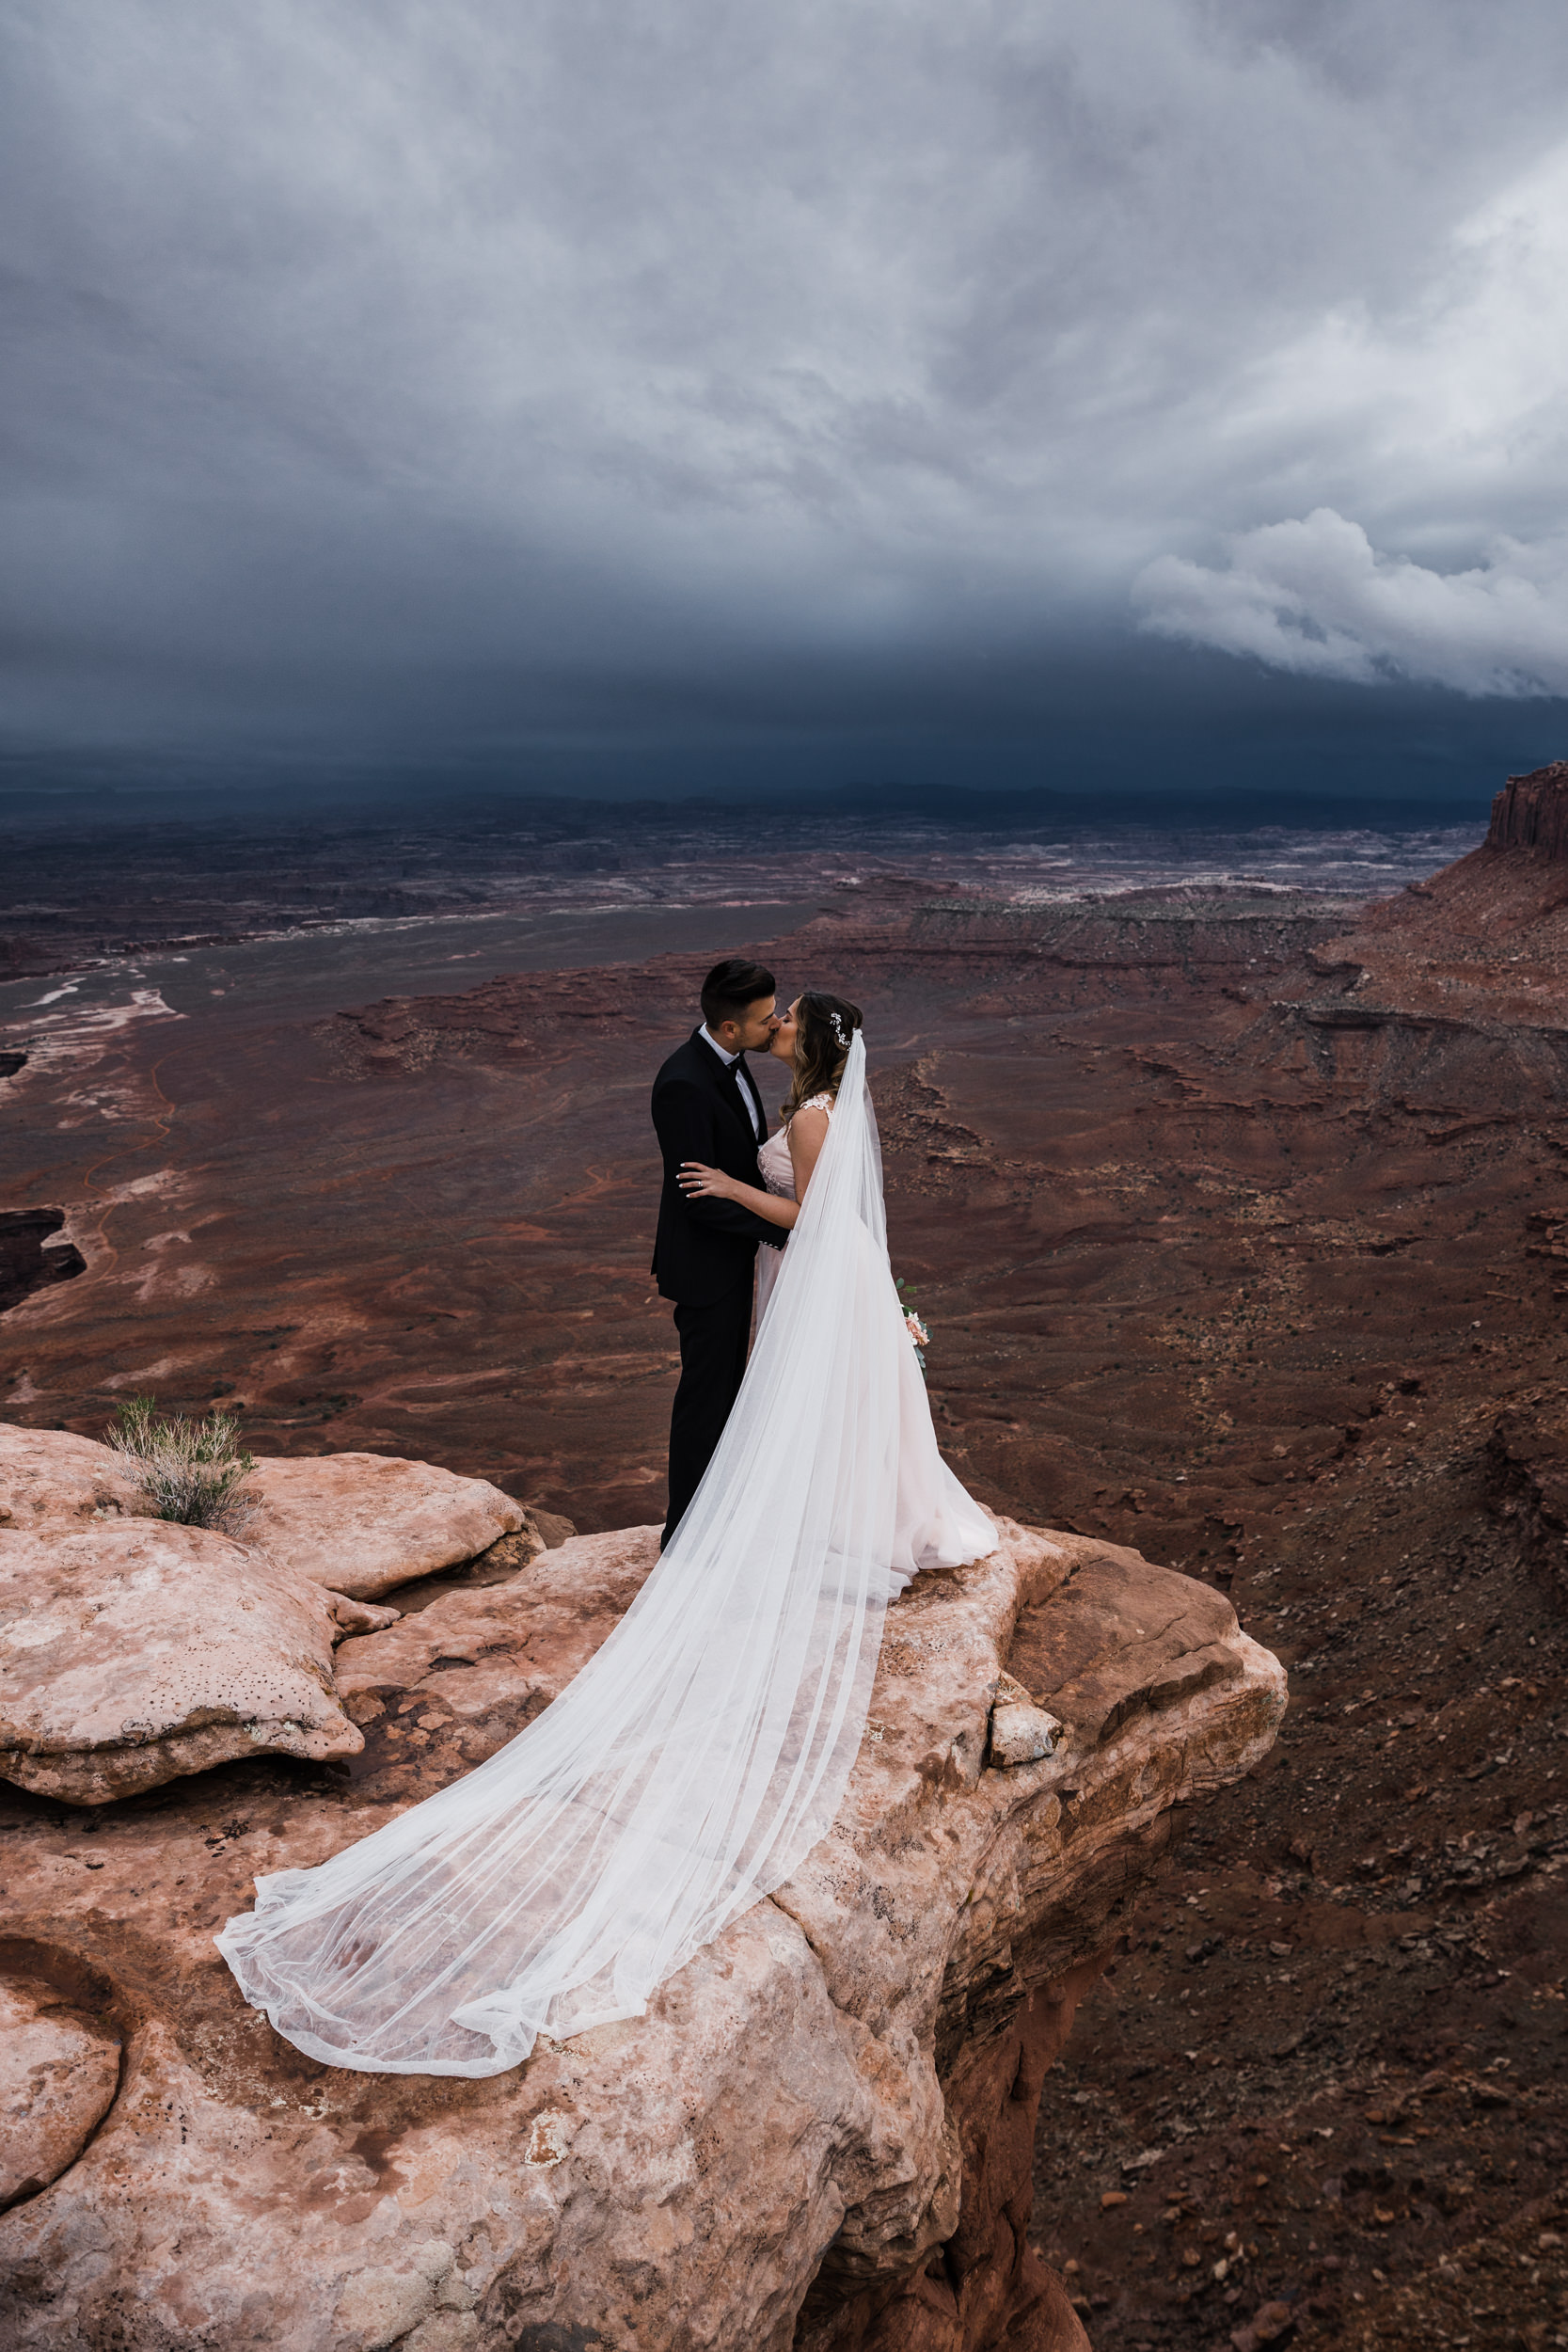 Hearnes-Elopement-Photography-Canyonlands-National-Park-Moab-Wedding-17.jpg